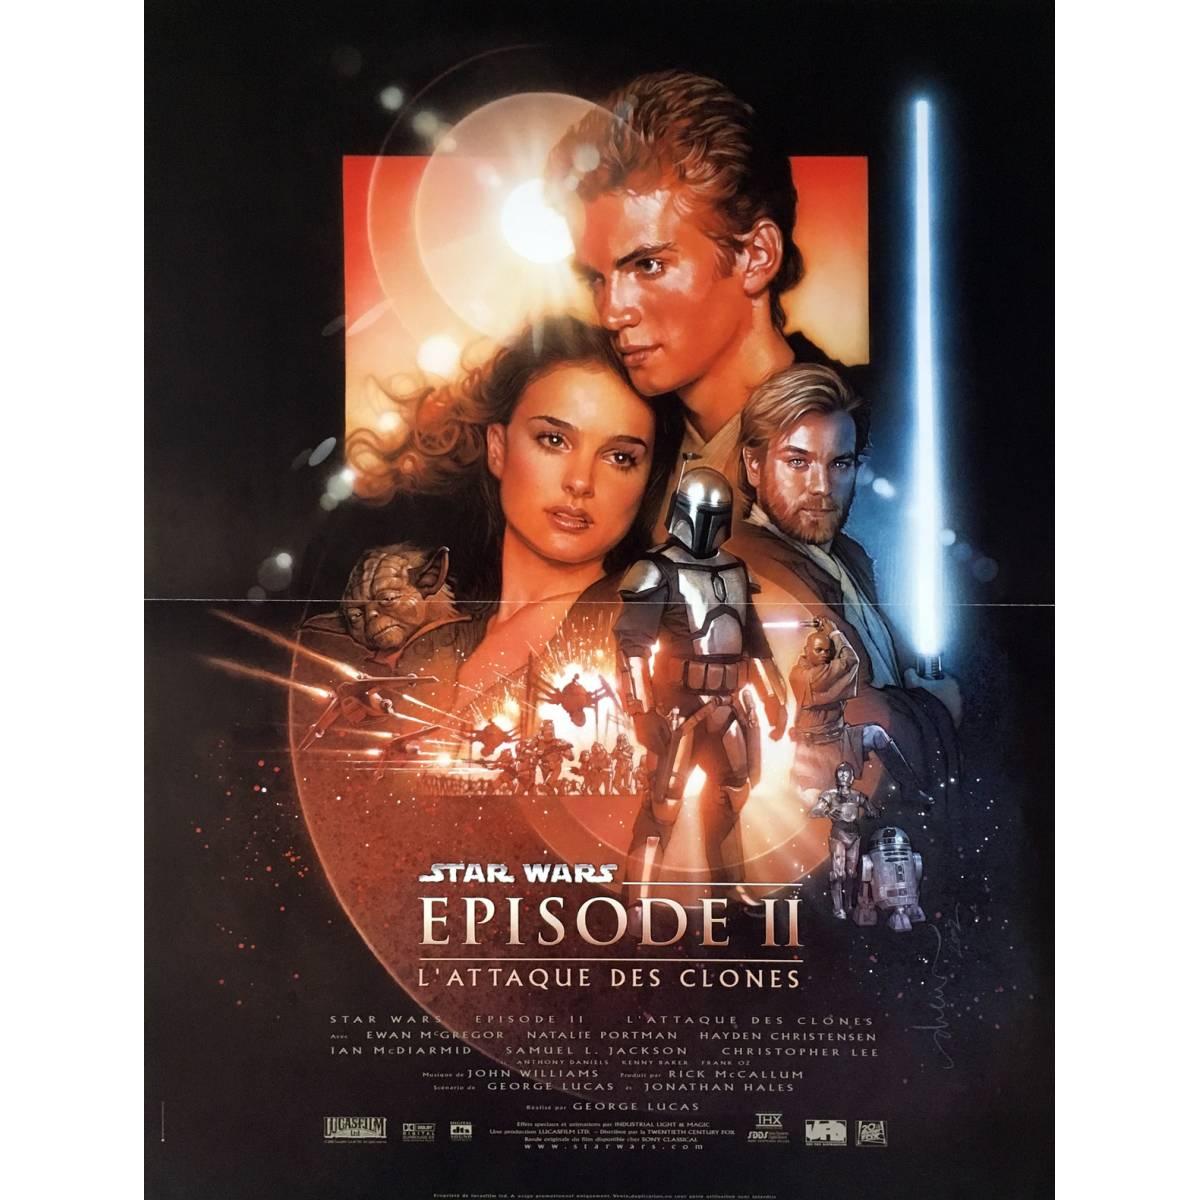 star-wars-l-attaque-des-clones-affiche-de-film-40x60-cm-2002-natalie-portman-george-lucas.jpg